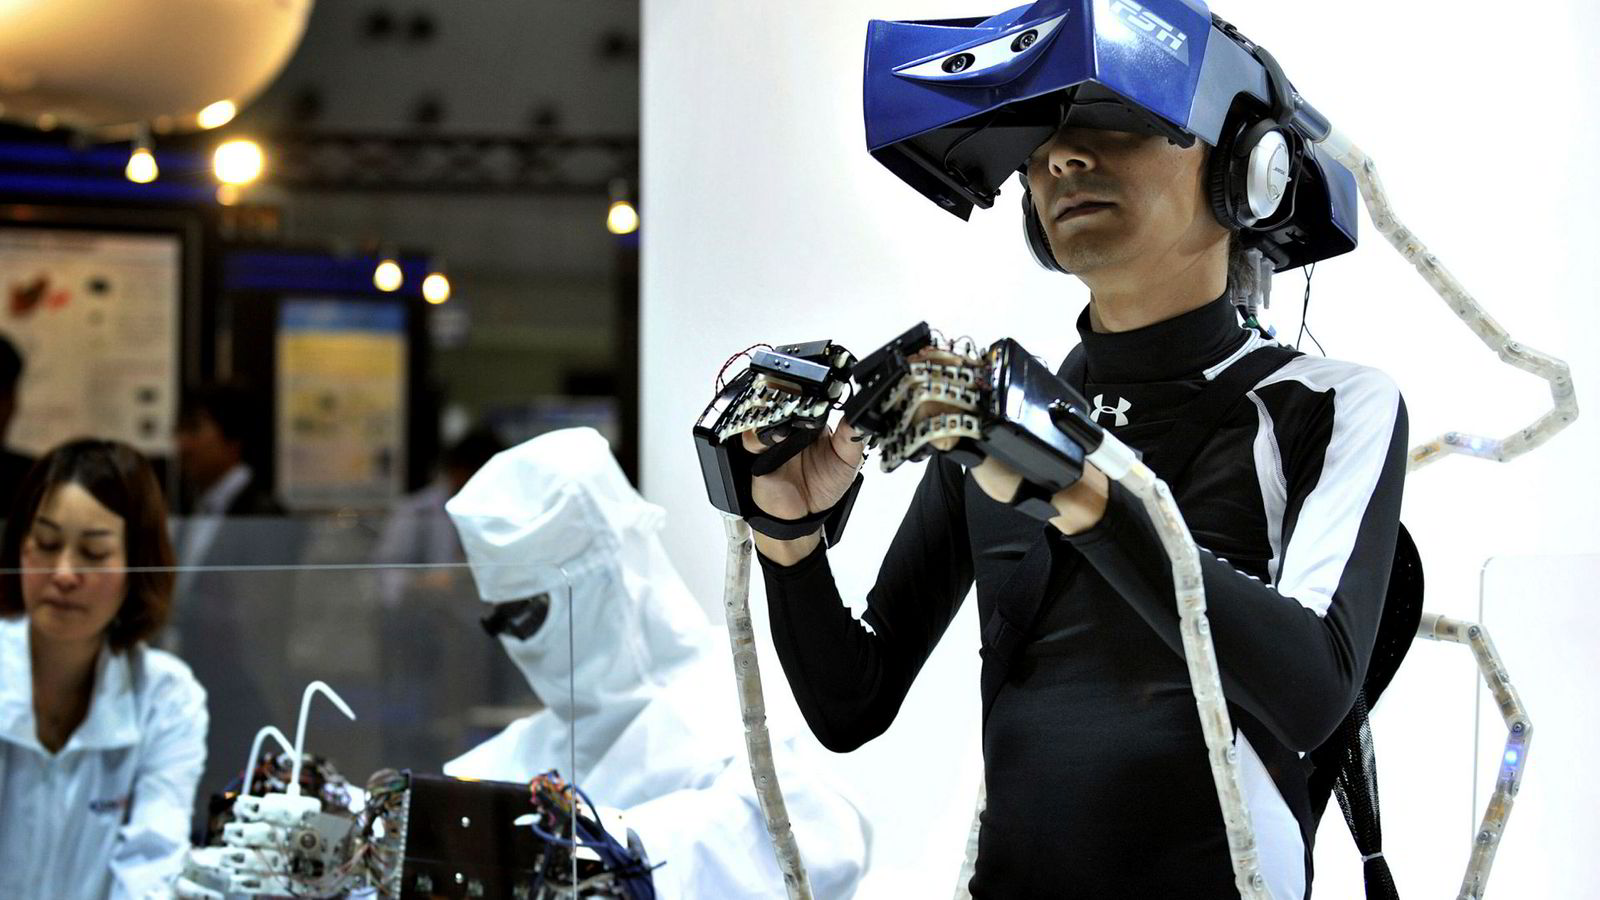 Mulighet til fjernstyring av roboter åpner for at arbeidsplasser kan flyttes langt unna selve roboten, til land hvor arbeidskraften er langt billigere.